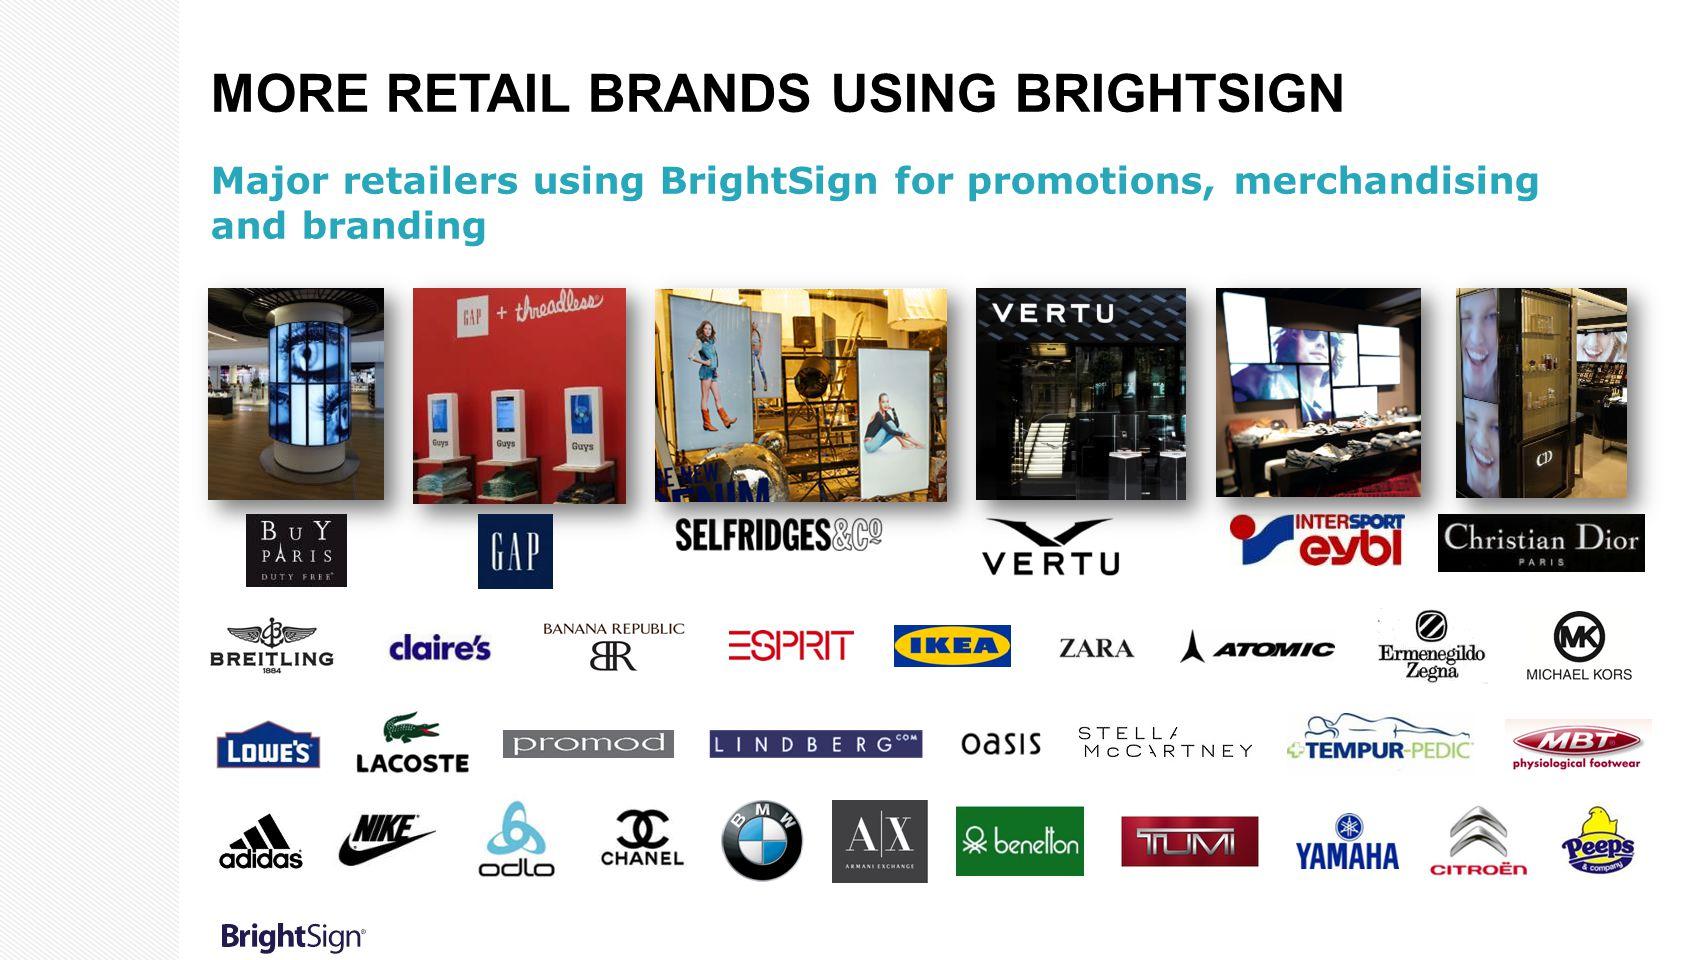 More Retail Brands Using BrightSign